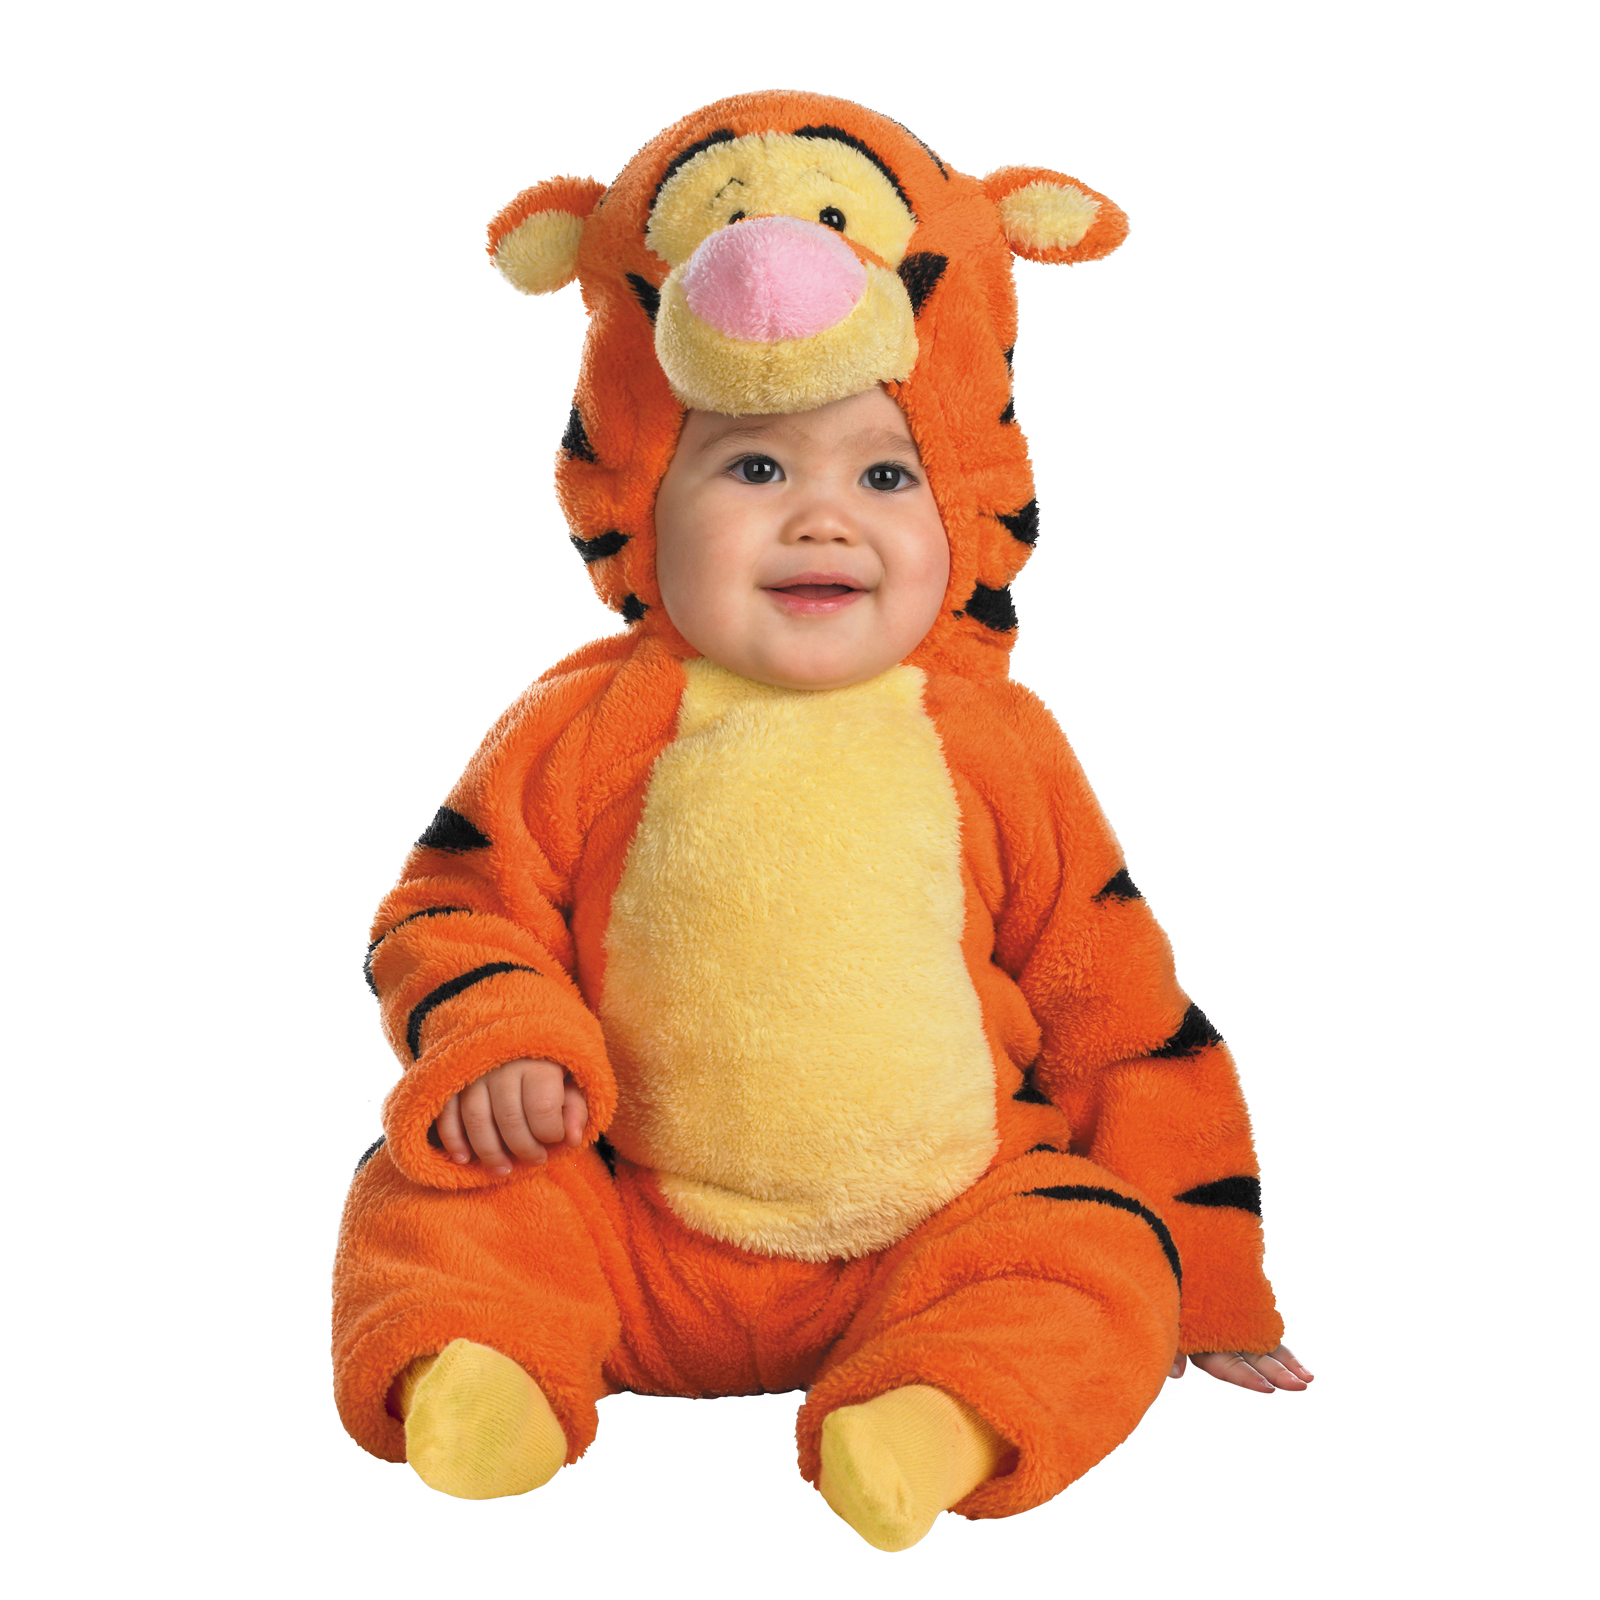 Winnie the Pooh - Tigger Kanga Winnie The Pooh Costume